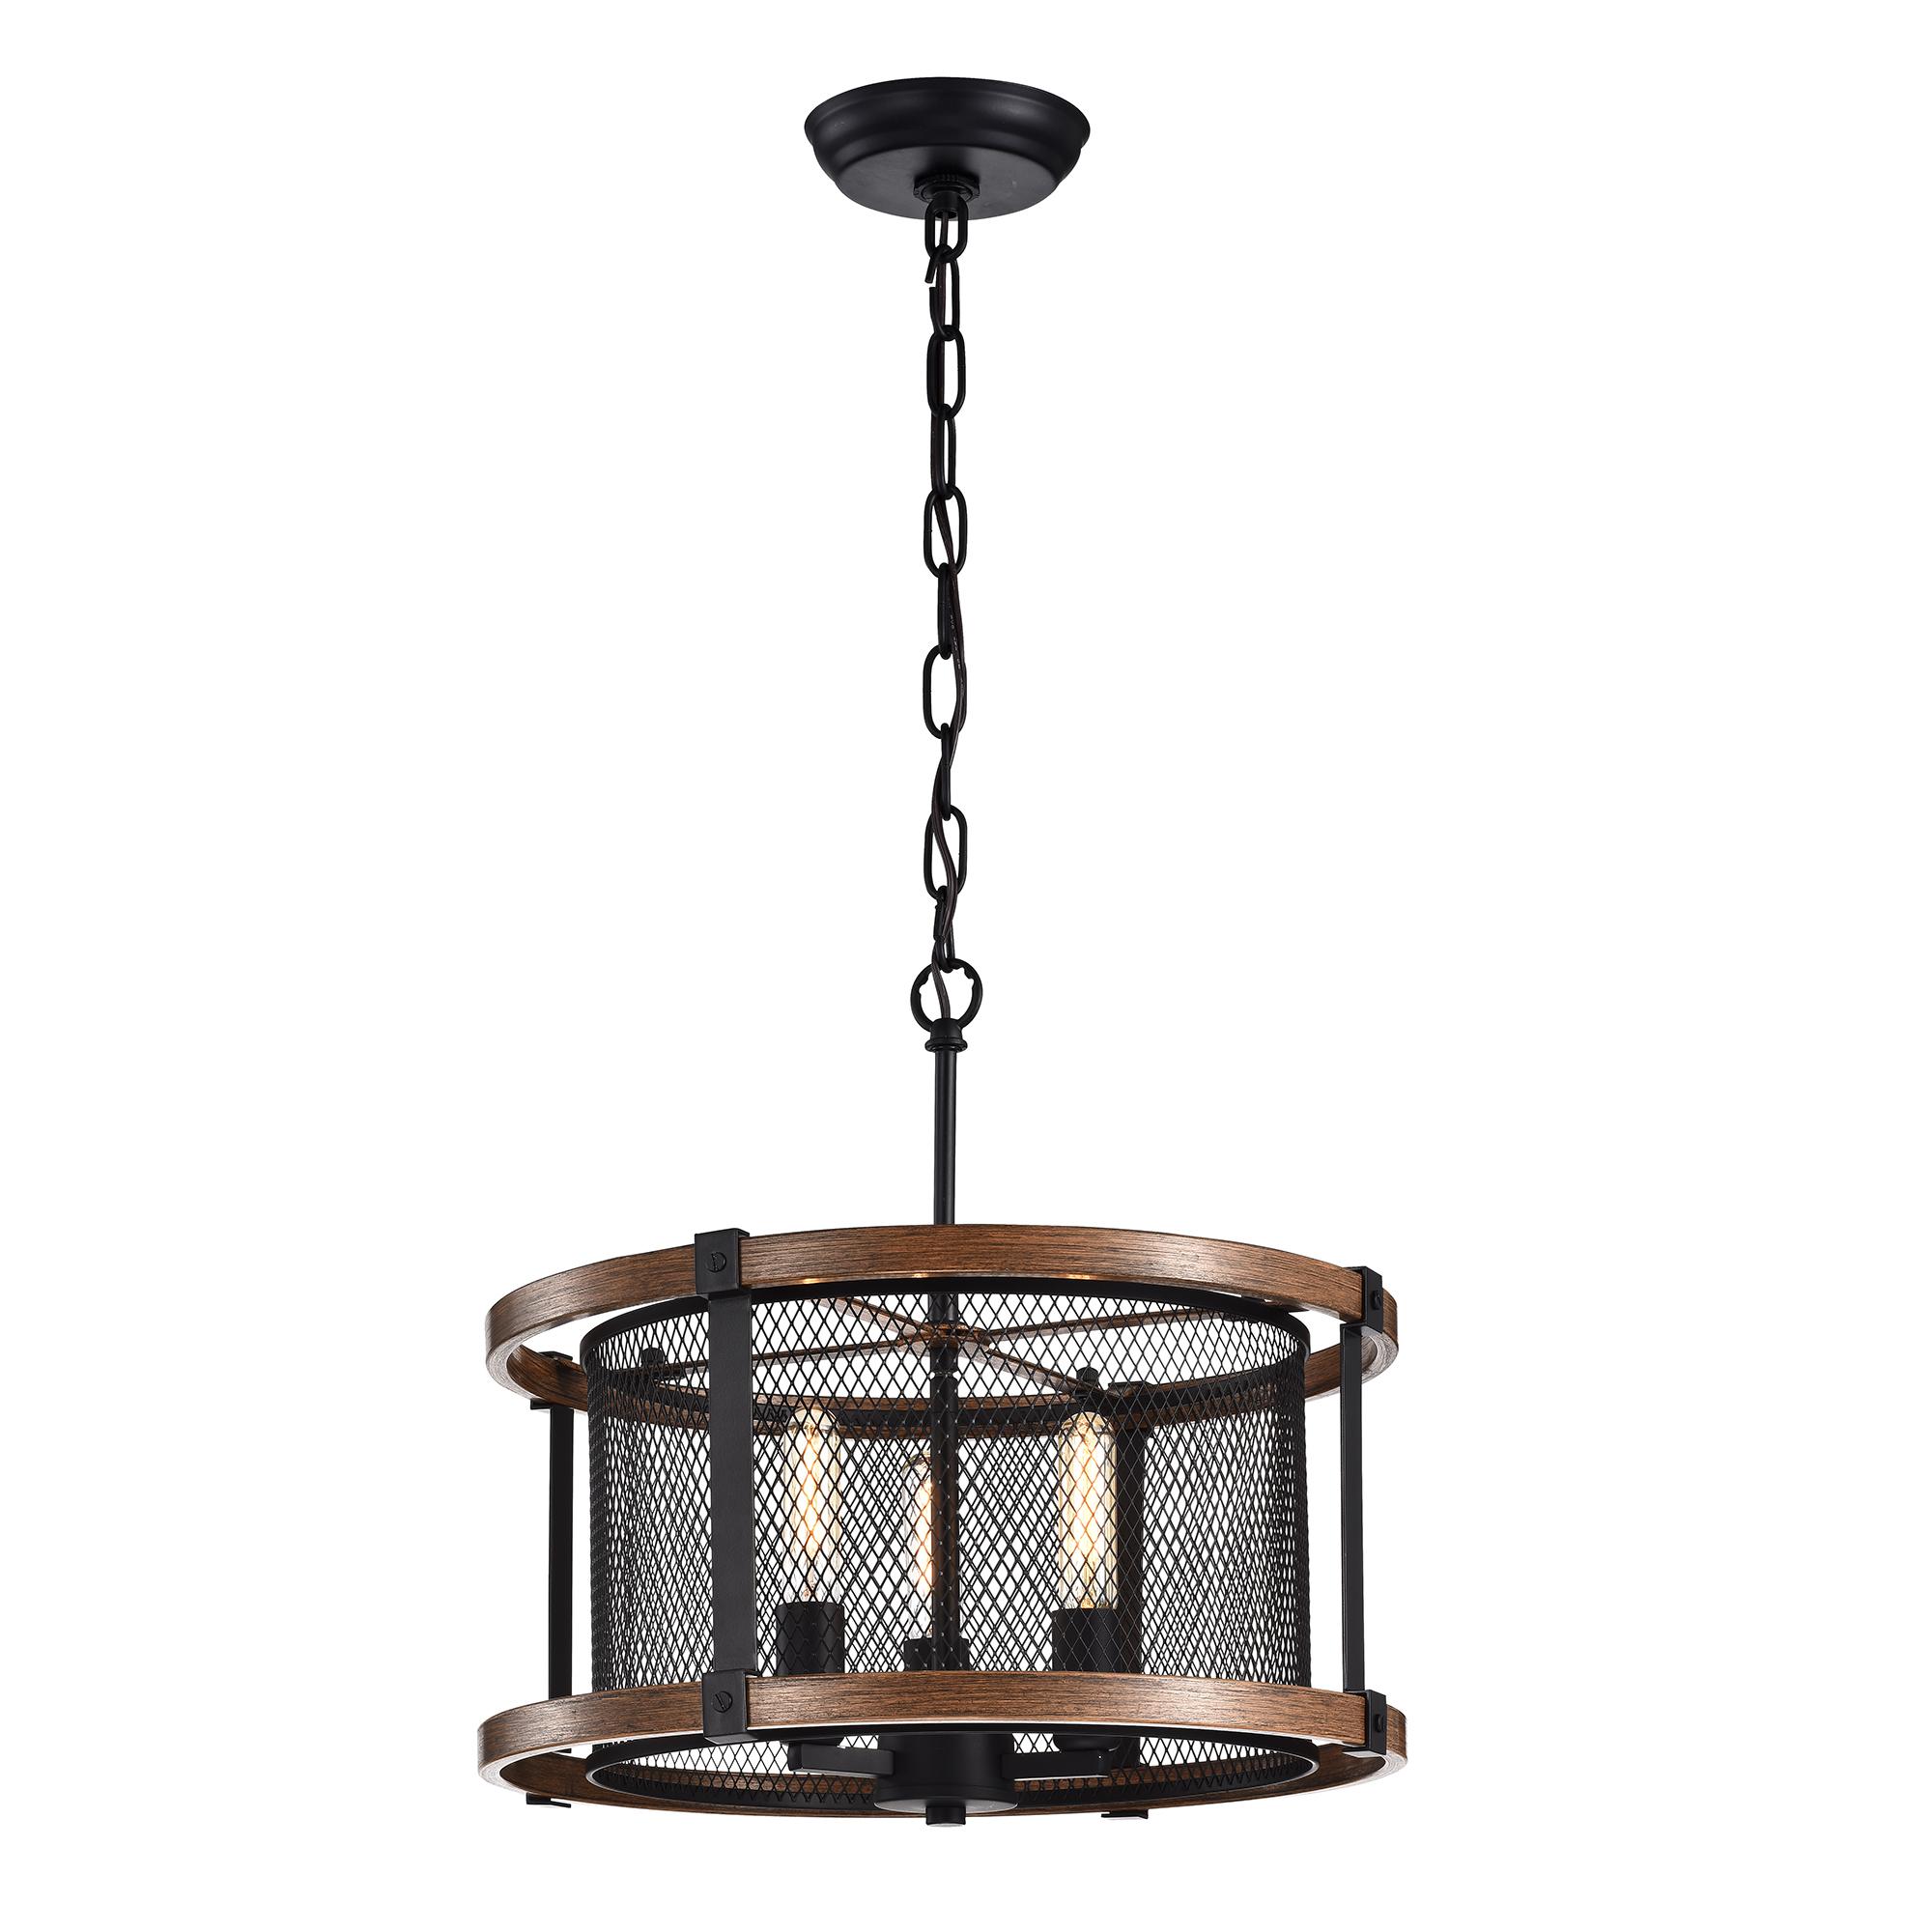 Airi Imitation Wood Grain/Black 3-light Chandelier